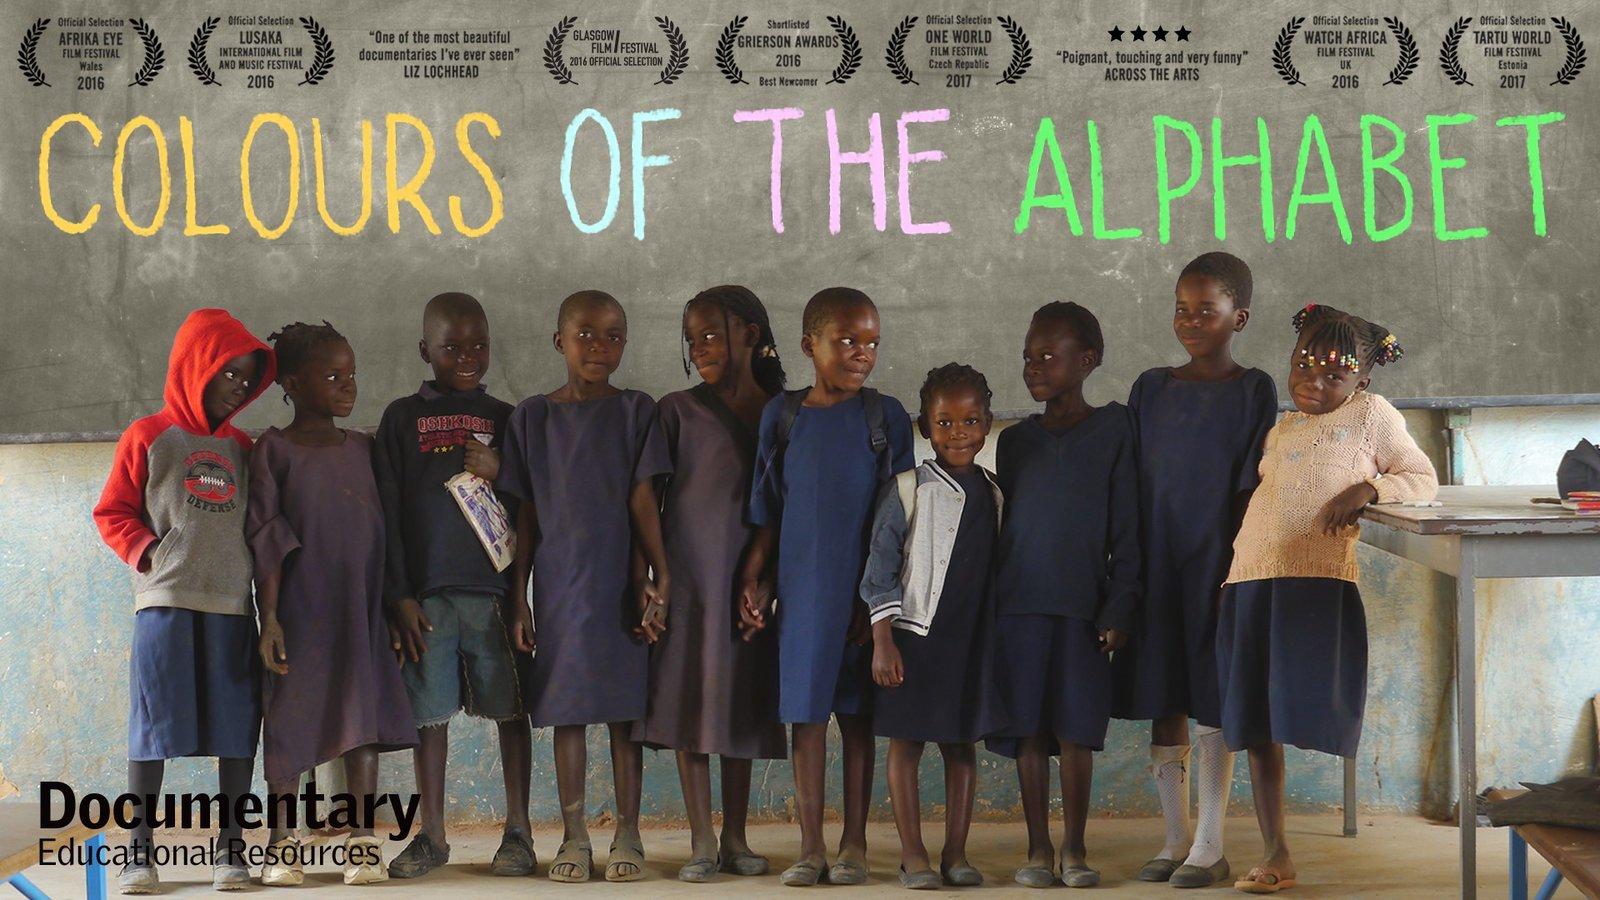 Colours of the Alphabet